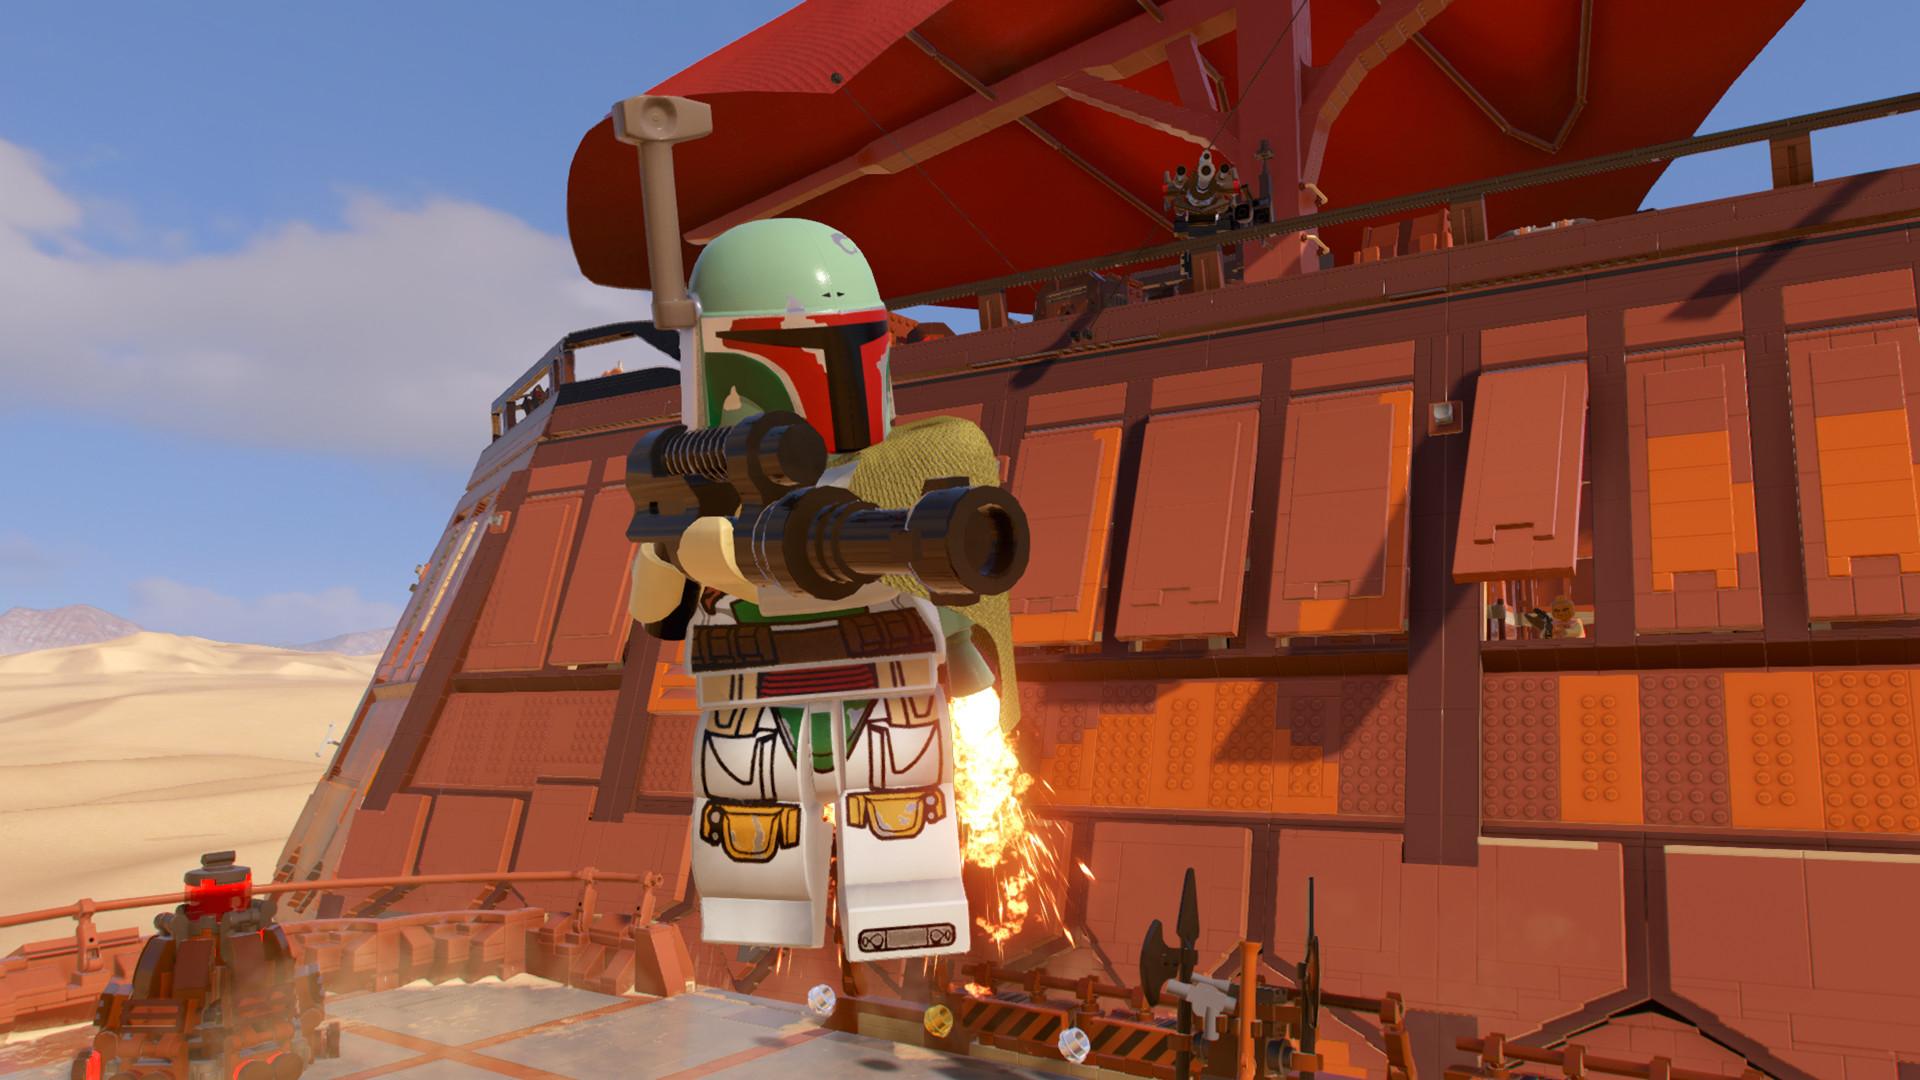 Lego Star Wars: The Skywalker Saga Cover Art Revealed